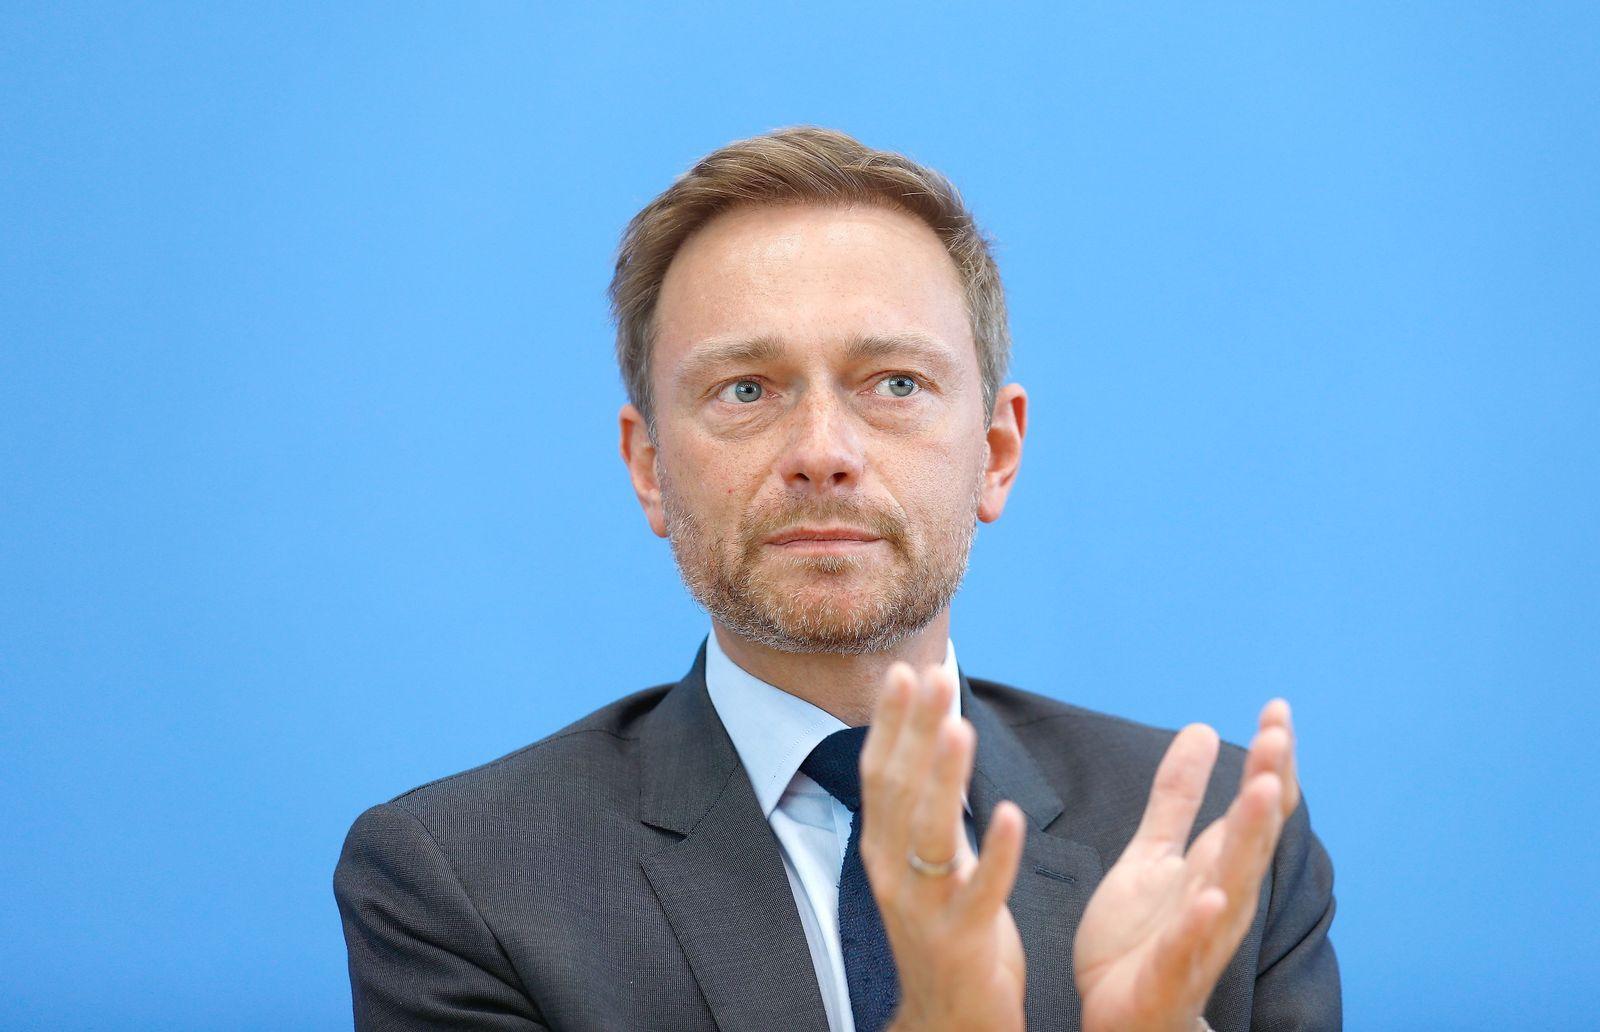 GERMANY-ELECTION/NRW